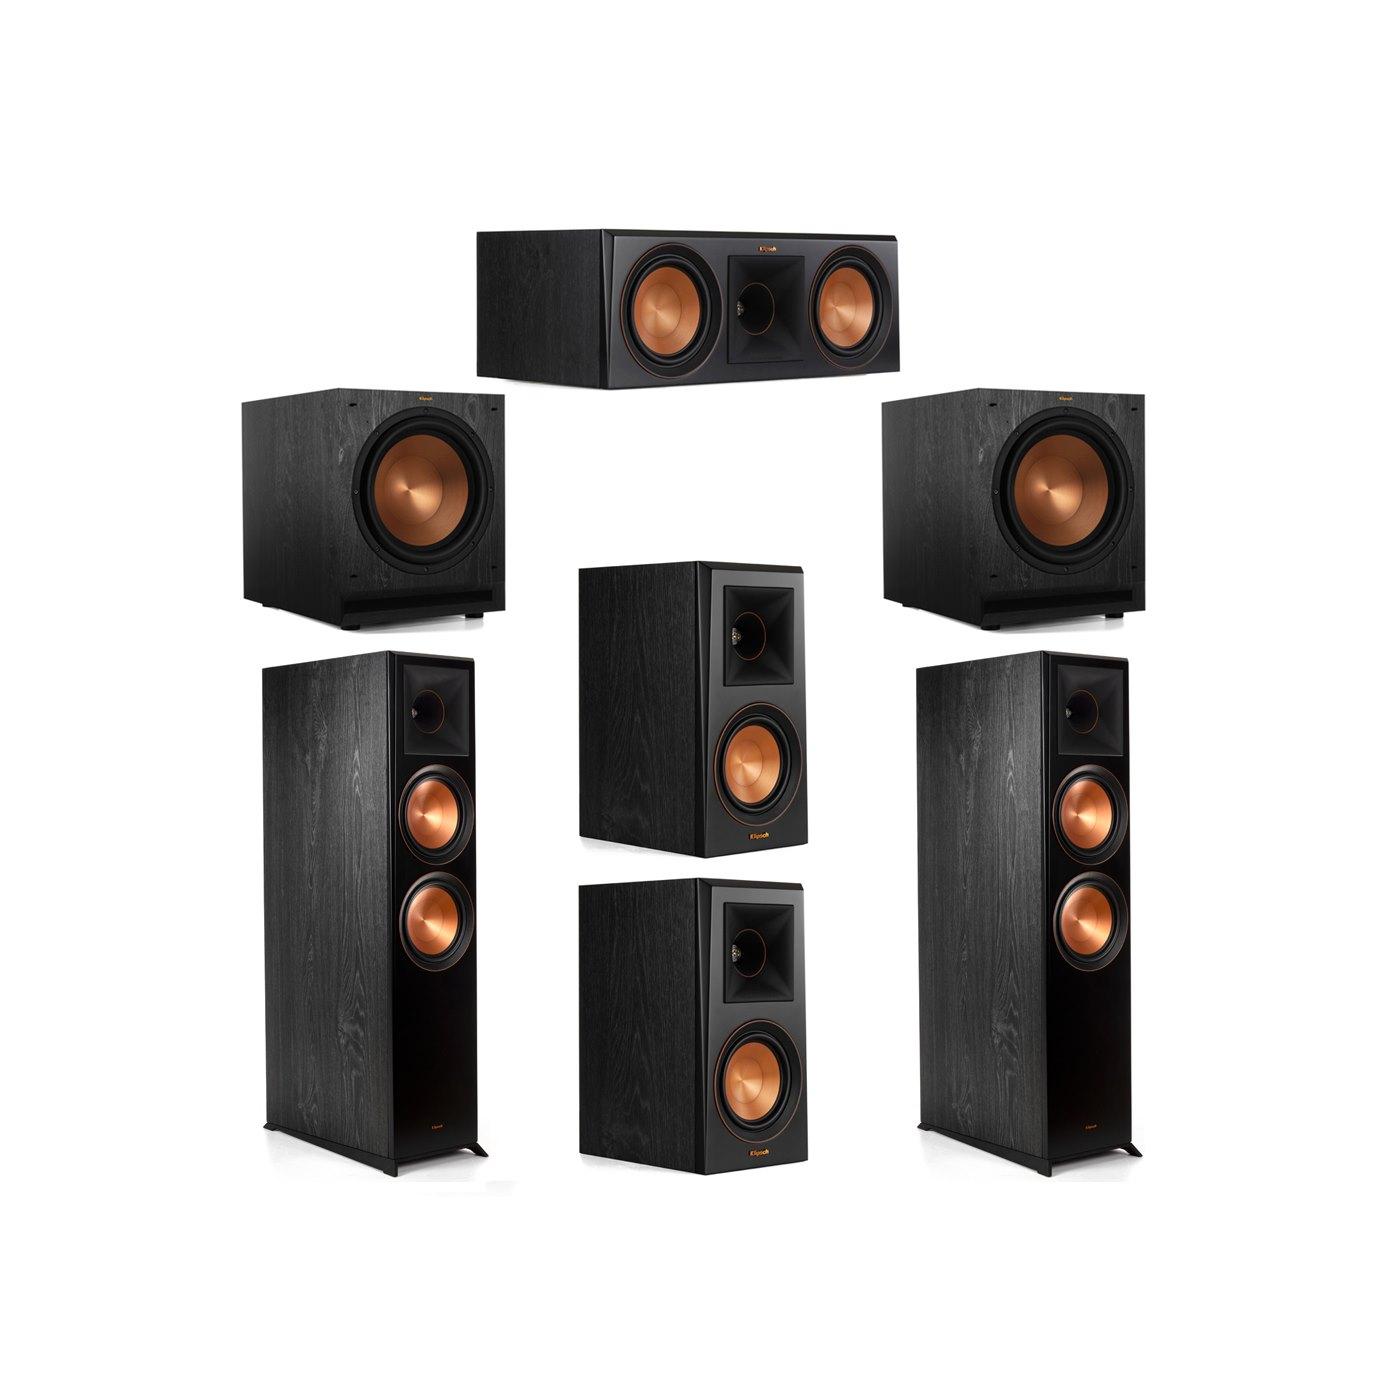 Klipsch 5.2 System with 2 RP-8000F Floorstanding Speakers, 1 Klipsch RP-600C Center Speaker, 2 Klipsch RP-500M Surround Speakers, 2 Klipsch SPL-120 Subwoofers